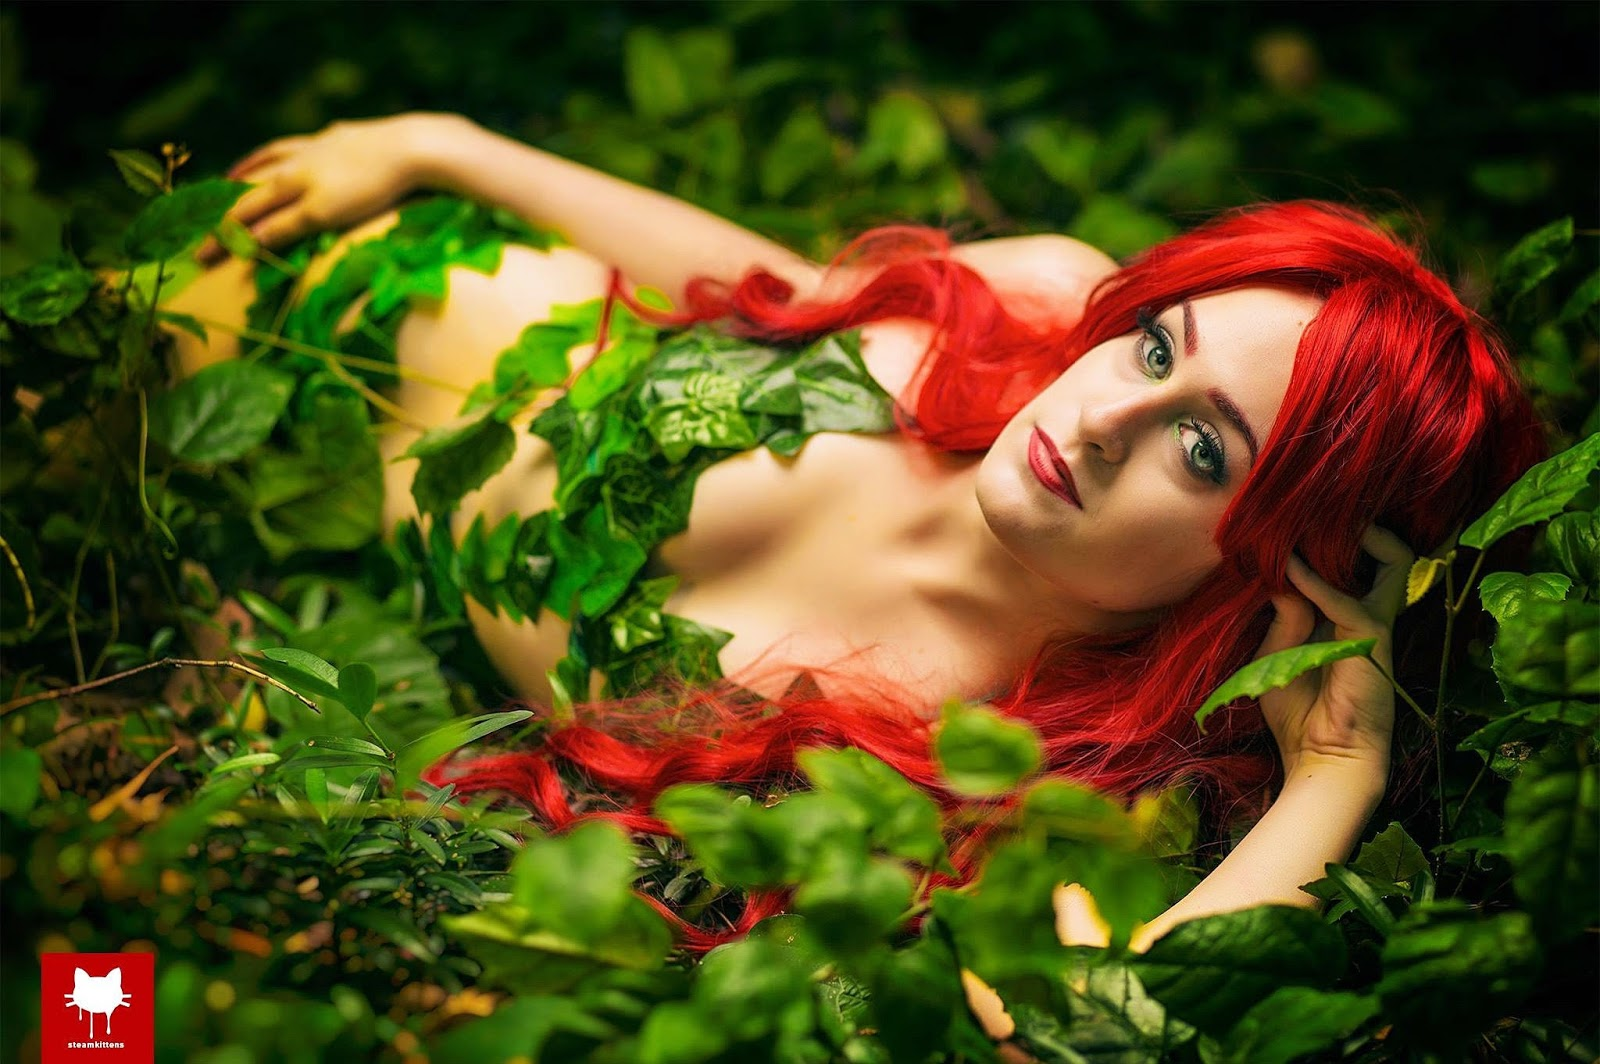 Poison ivy photo shoot